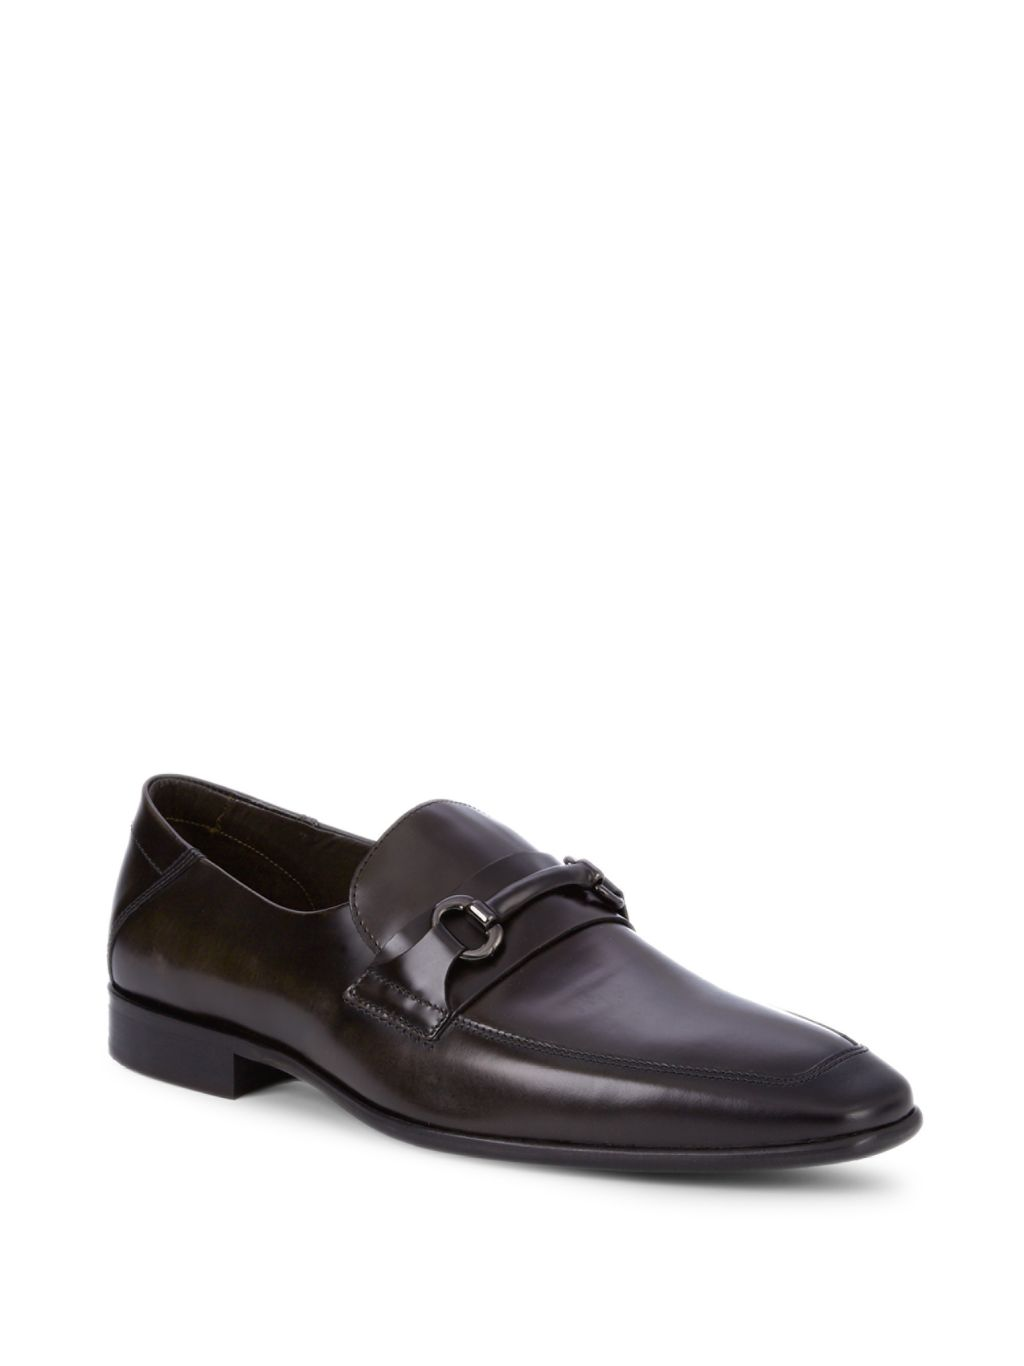 Bruno Magli Leather Horsebit Loafers